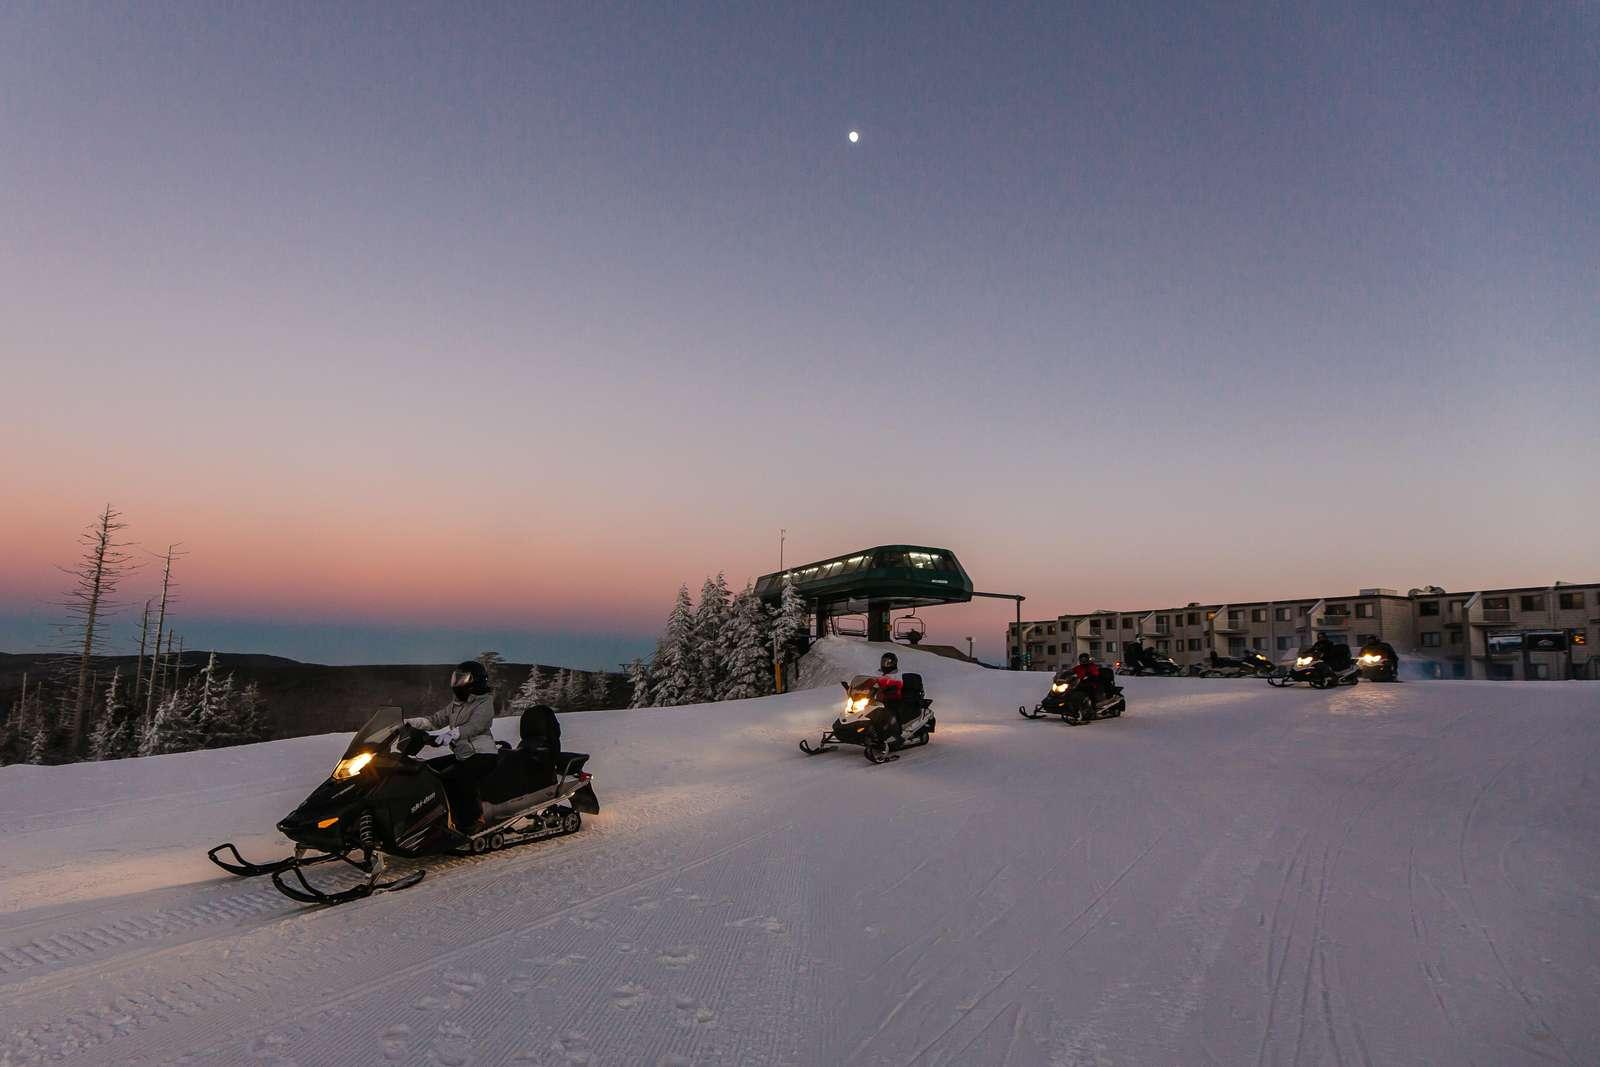 A fun winter paradise